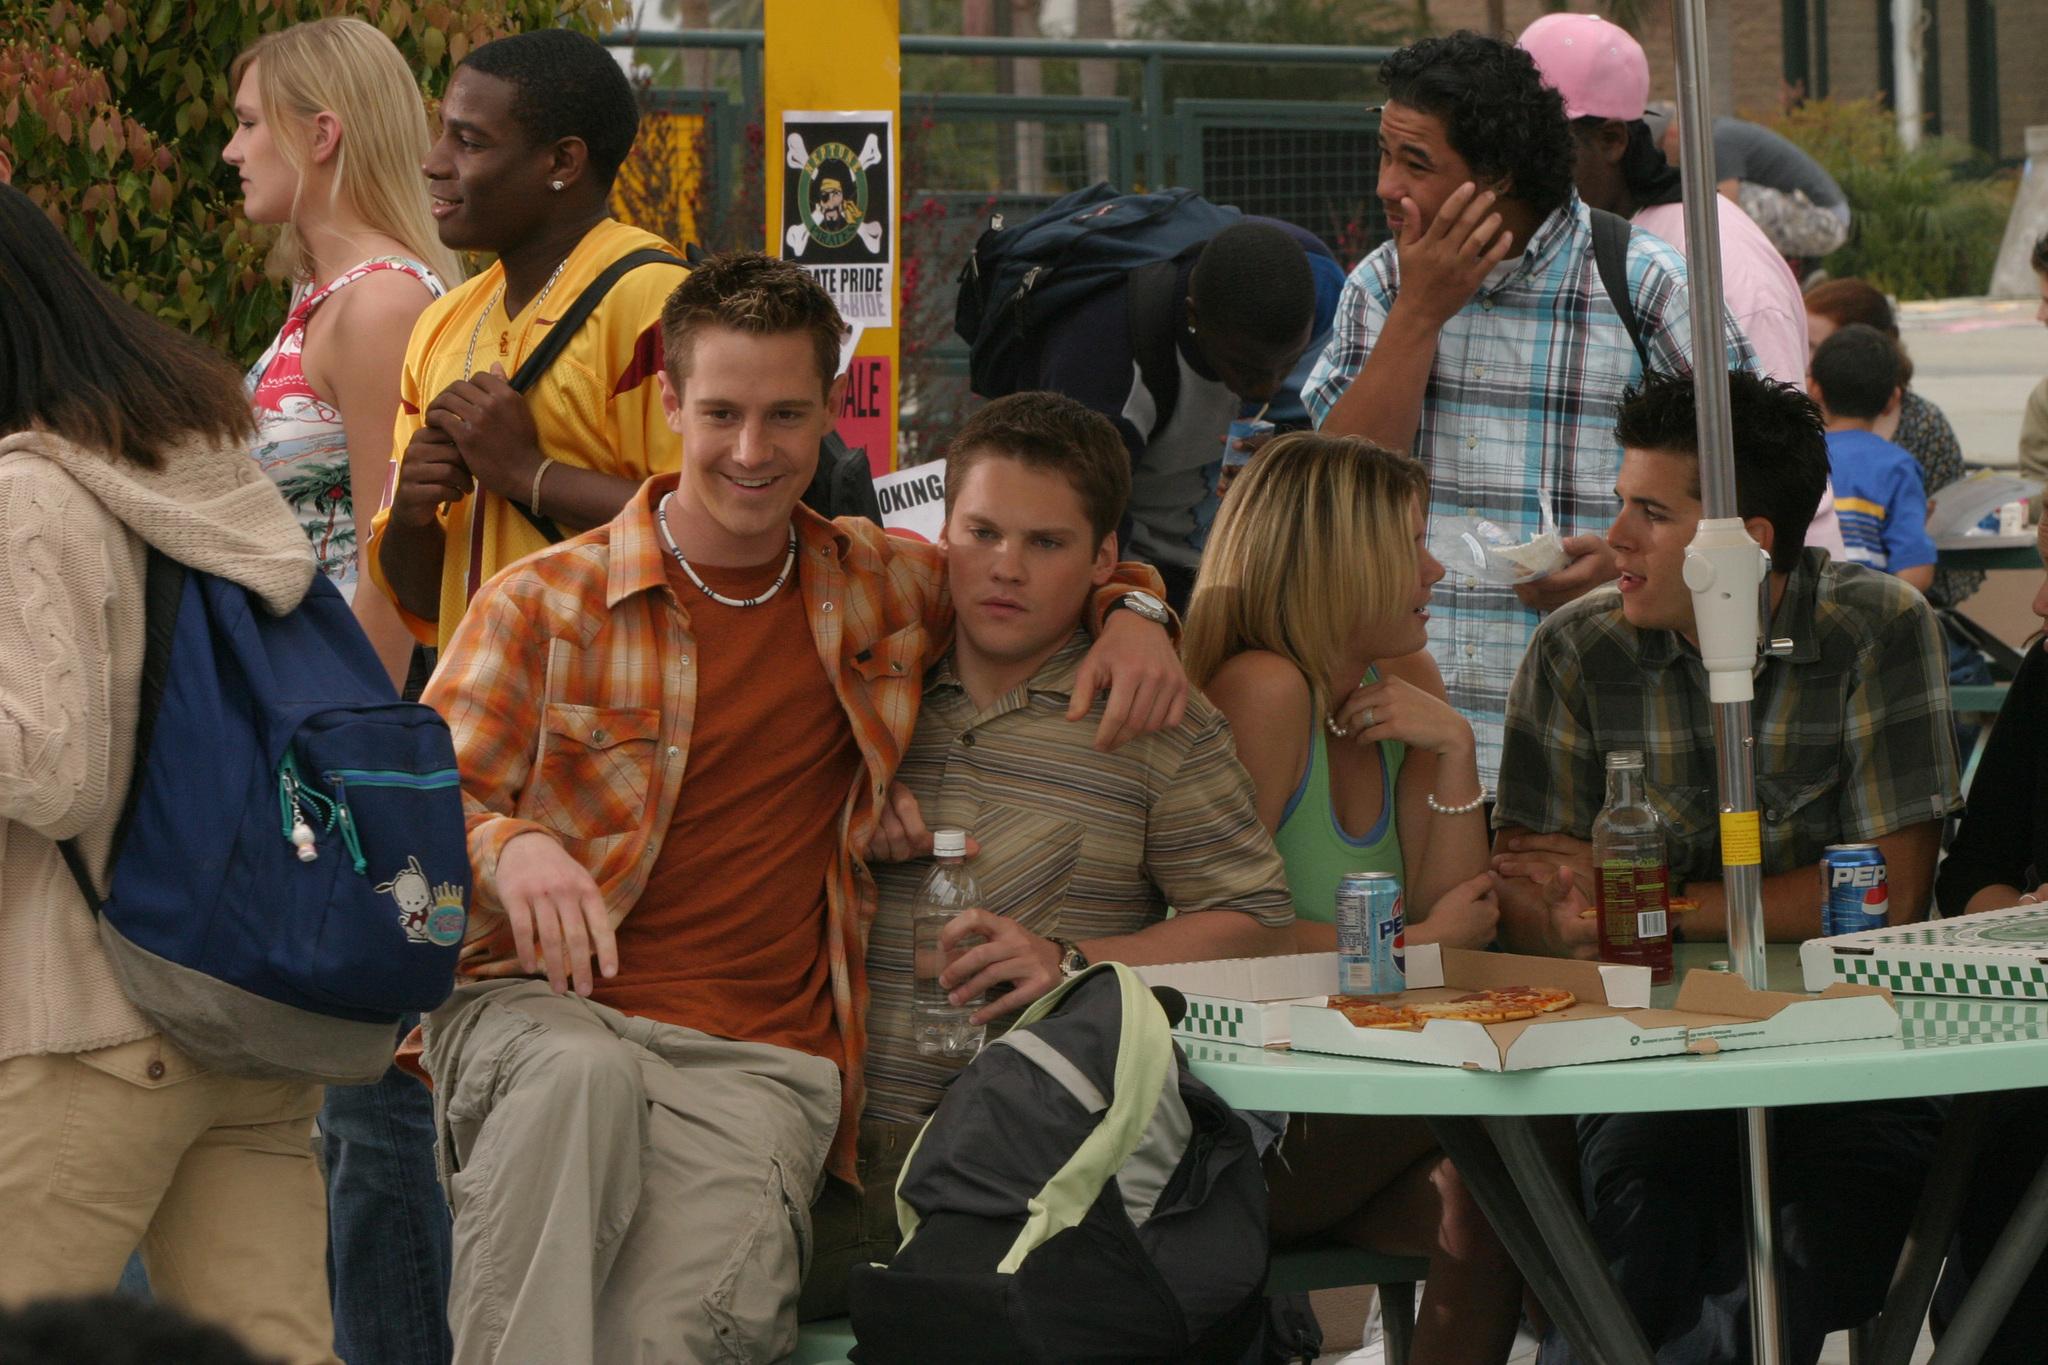 Jason Dohring and Teddy Dunn in Veronica Mars (2004)